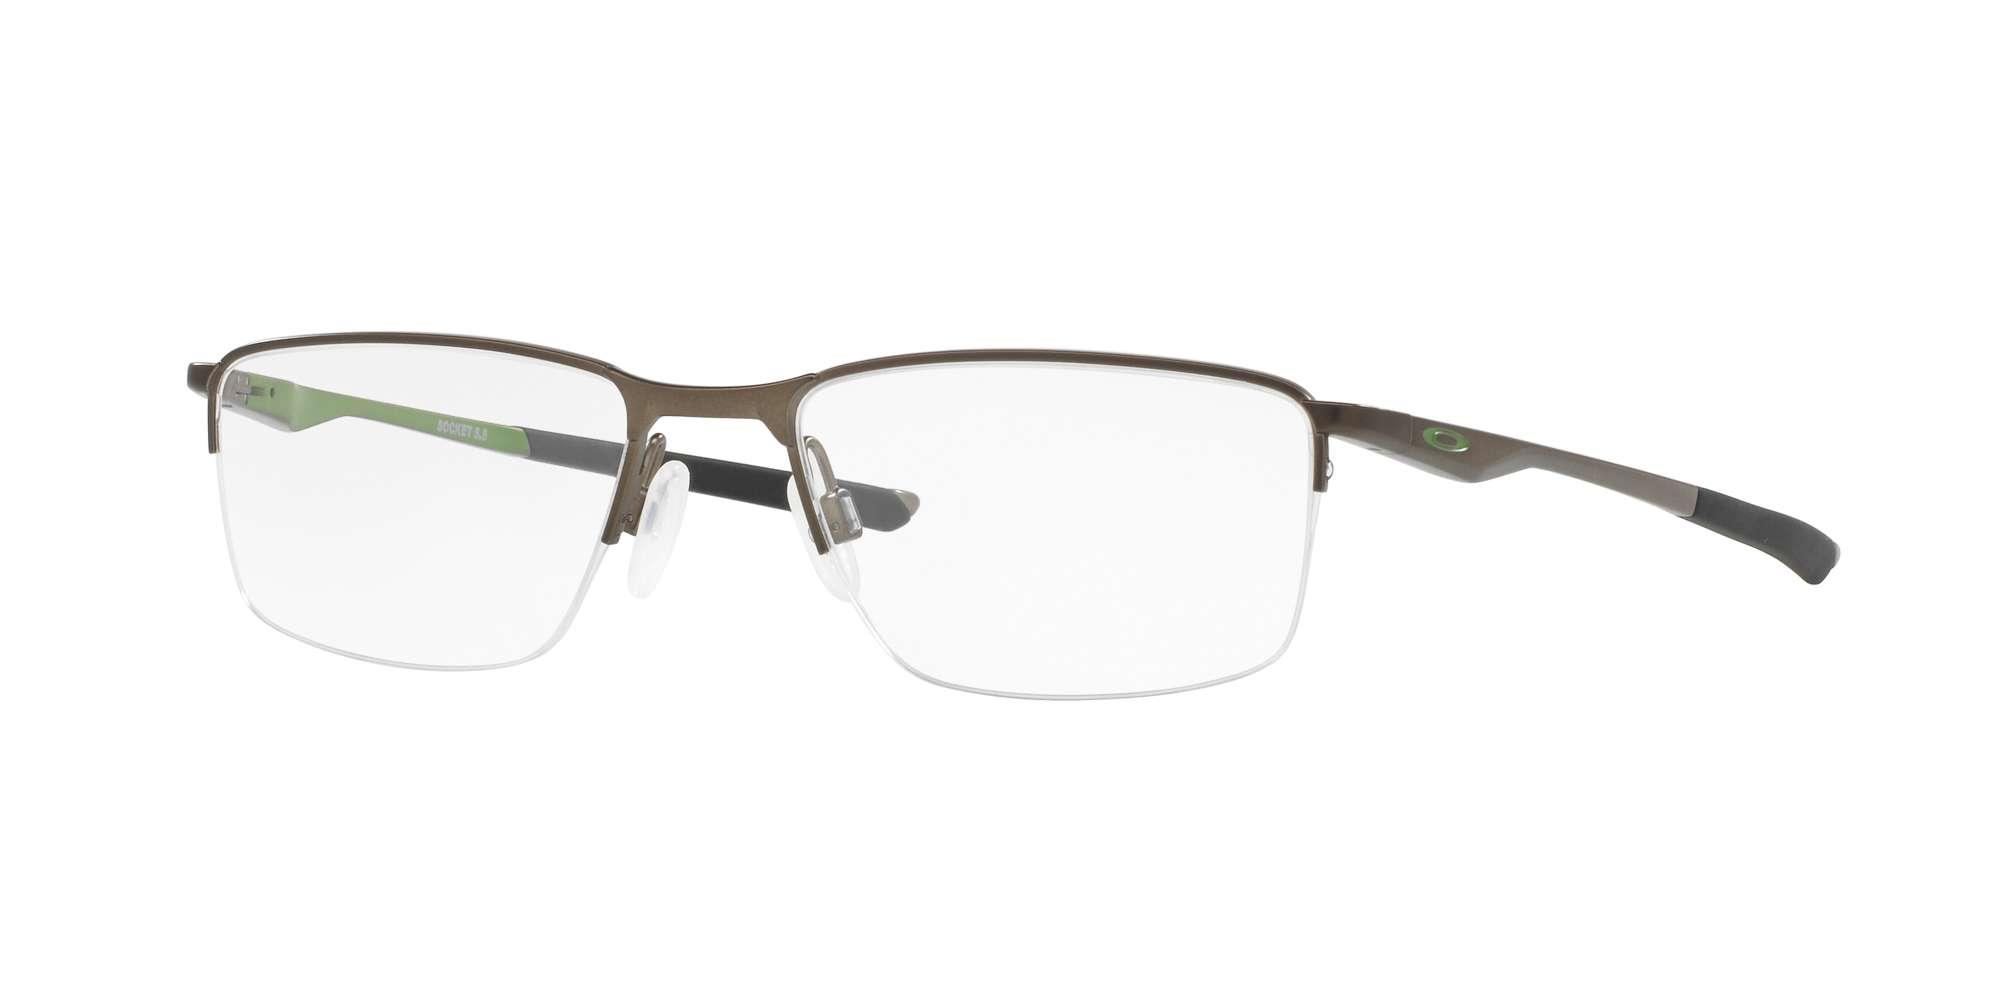 SATIN PEWTER / CLEAR lenses